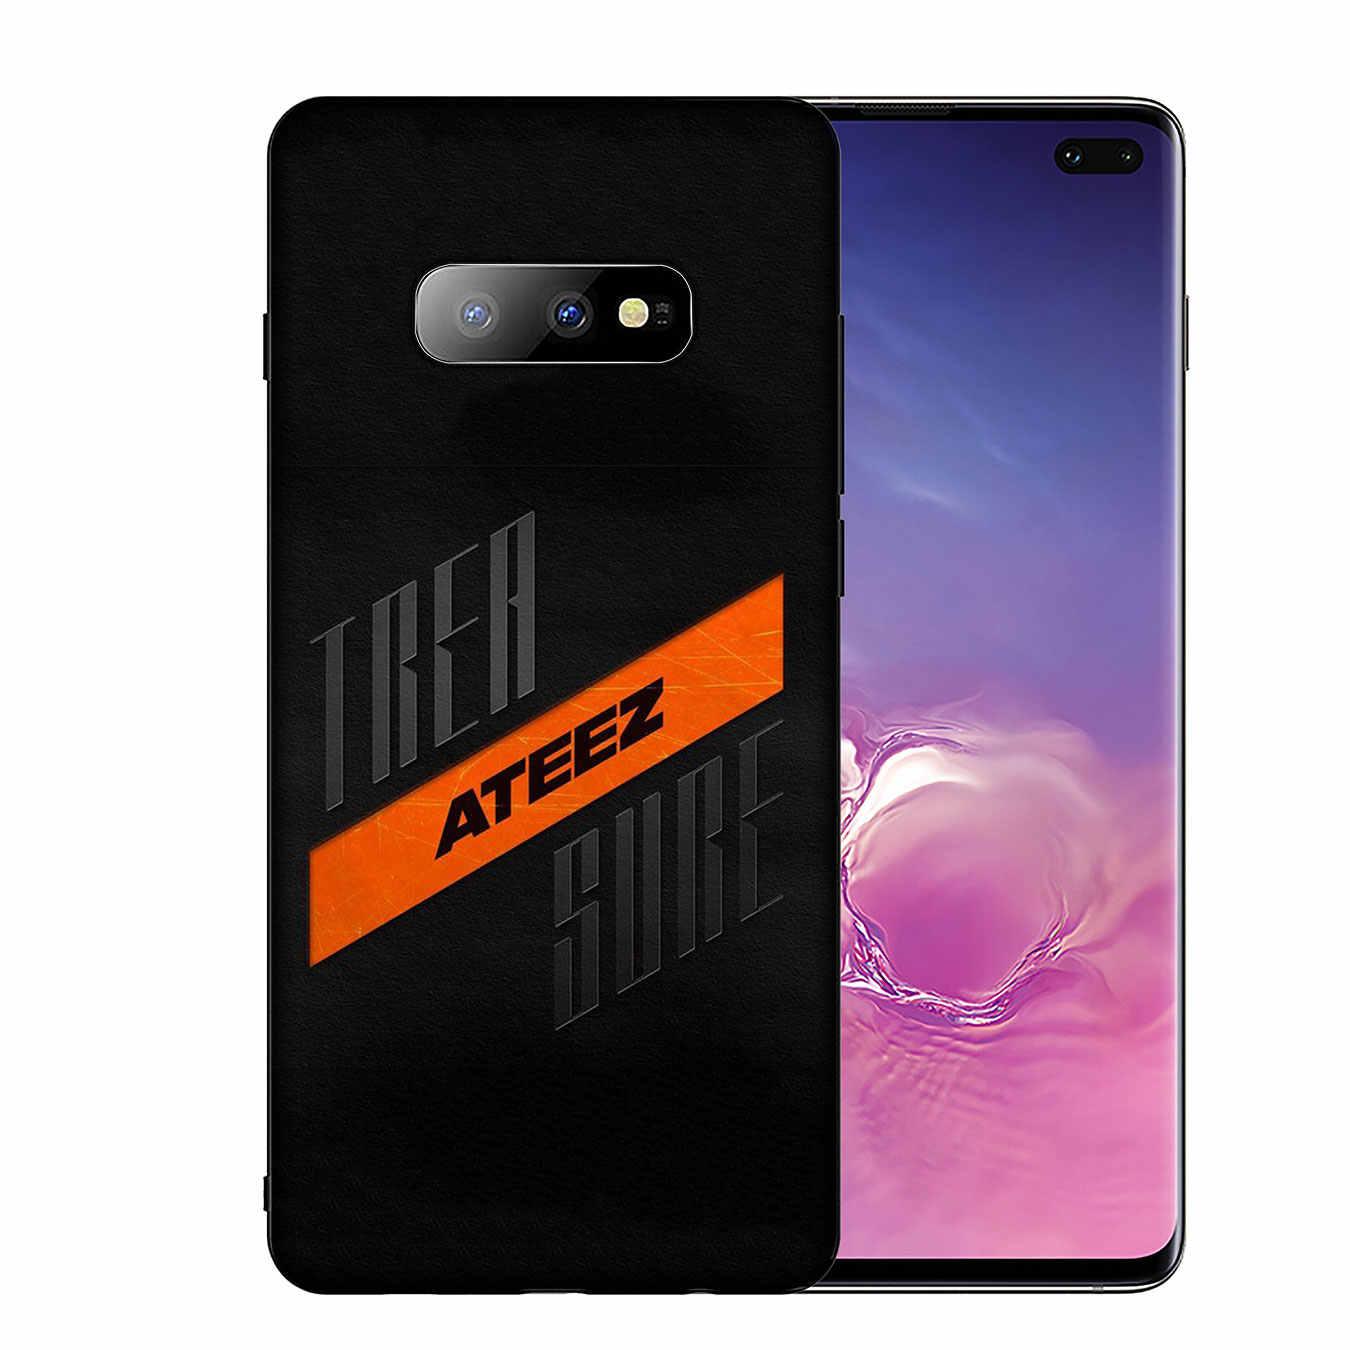 KPOP ATEEZ LOGO yumuşak silikon telefon samsung kılıfı Galaxy S10 E S9 S8 artı S6 S7 kenar S10e TPU siyah kapak